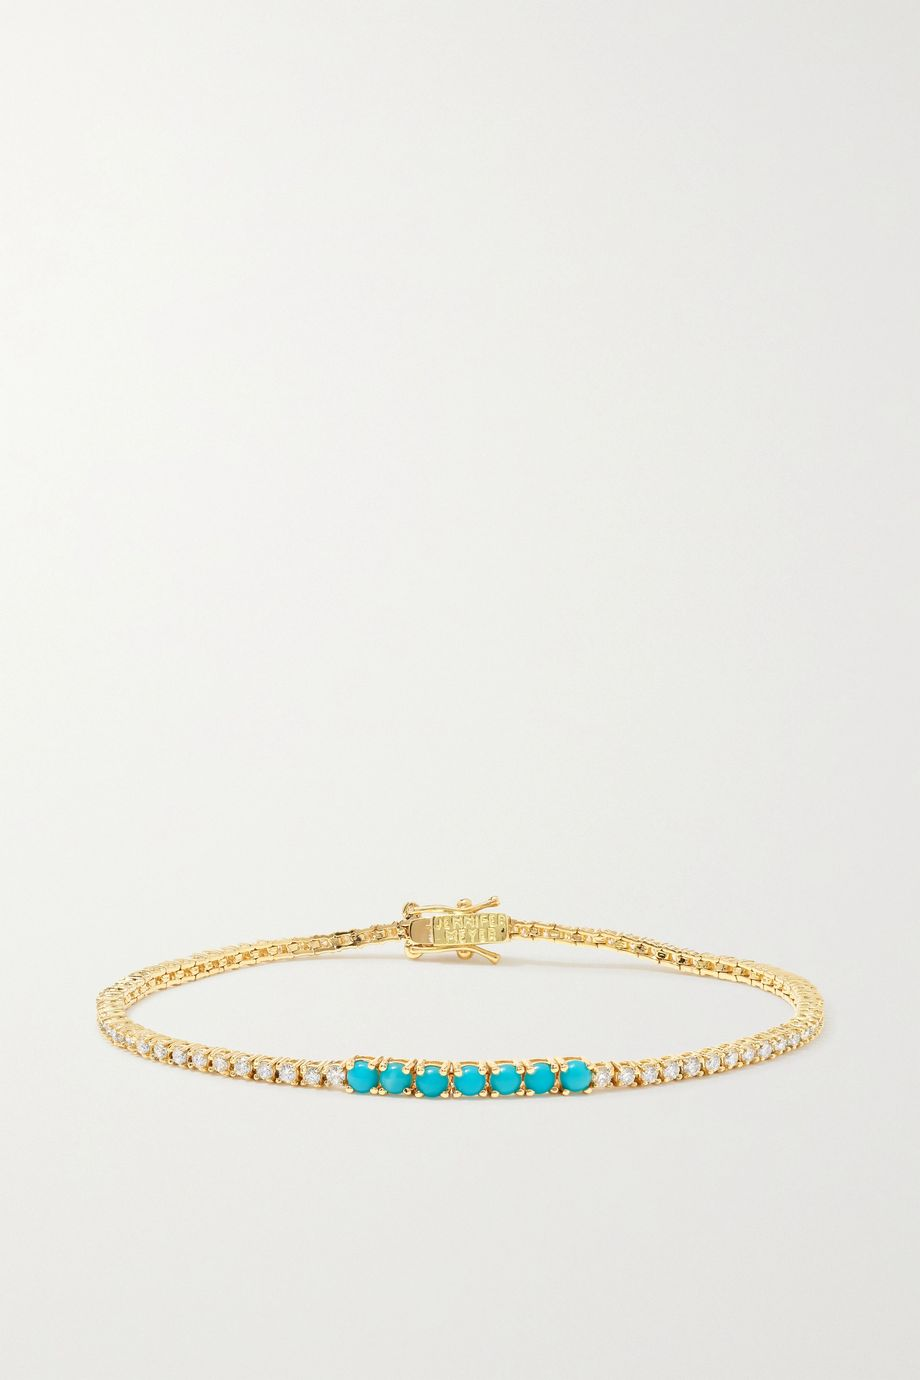 Jennifer Meyer Bracelet en or 18 carats, diamants et turquoises